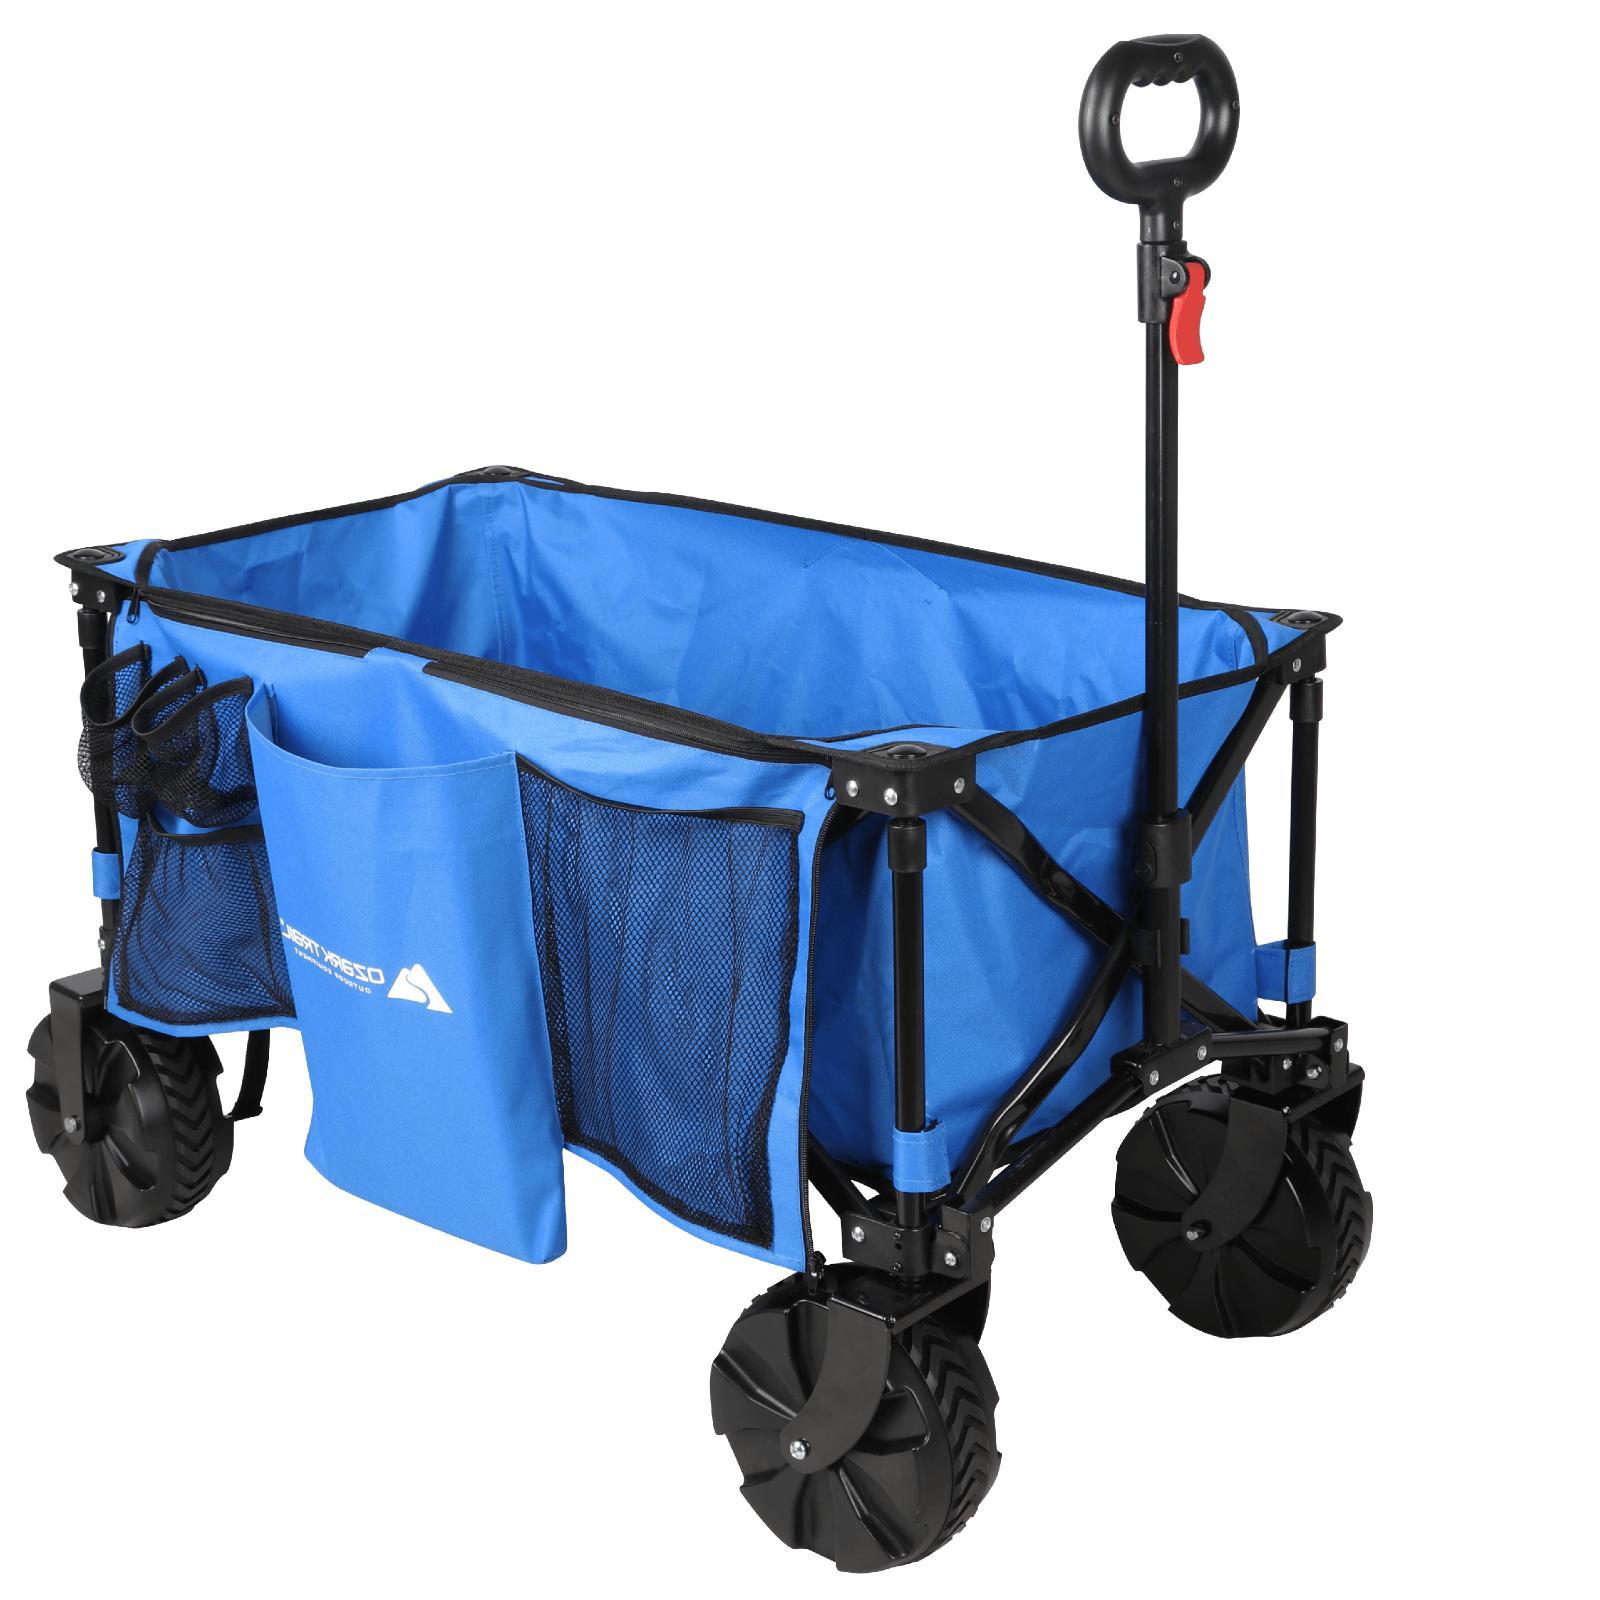 Wagon Cart Oversized Wheels All Terrain Beach Tailgate